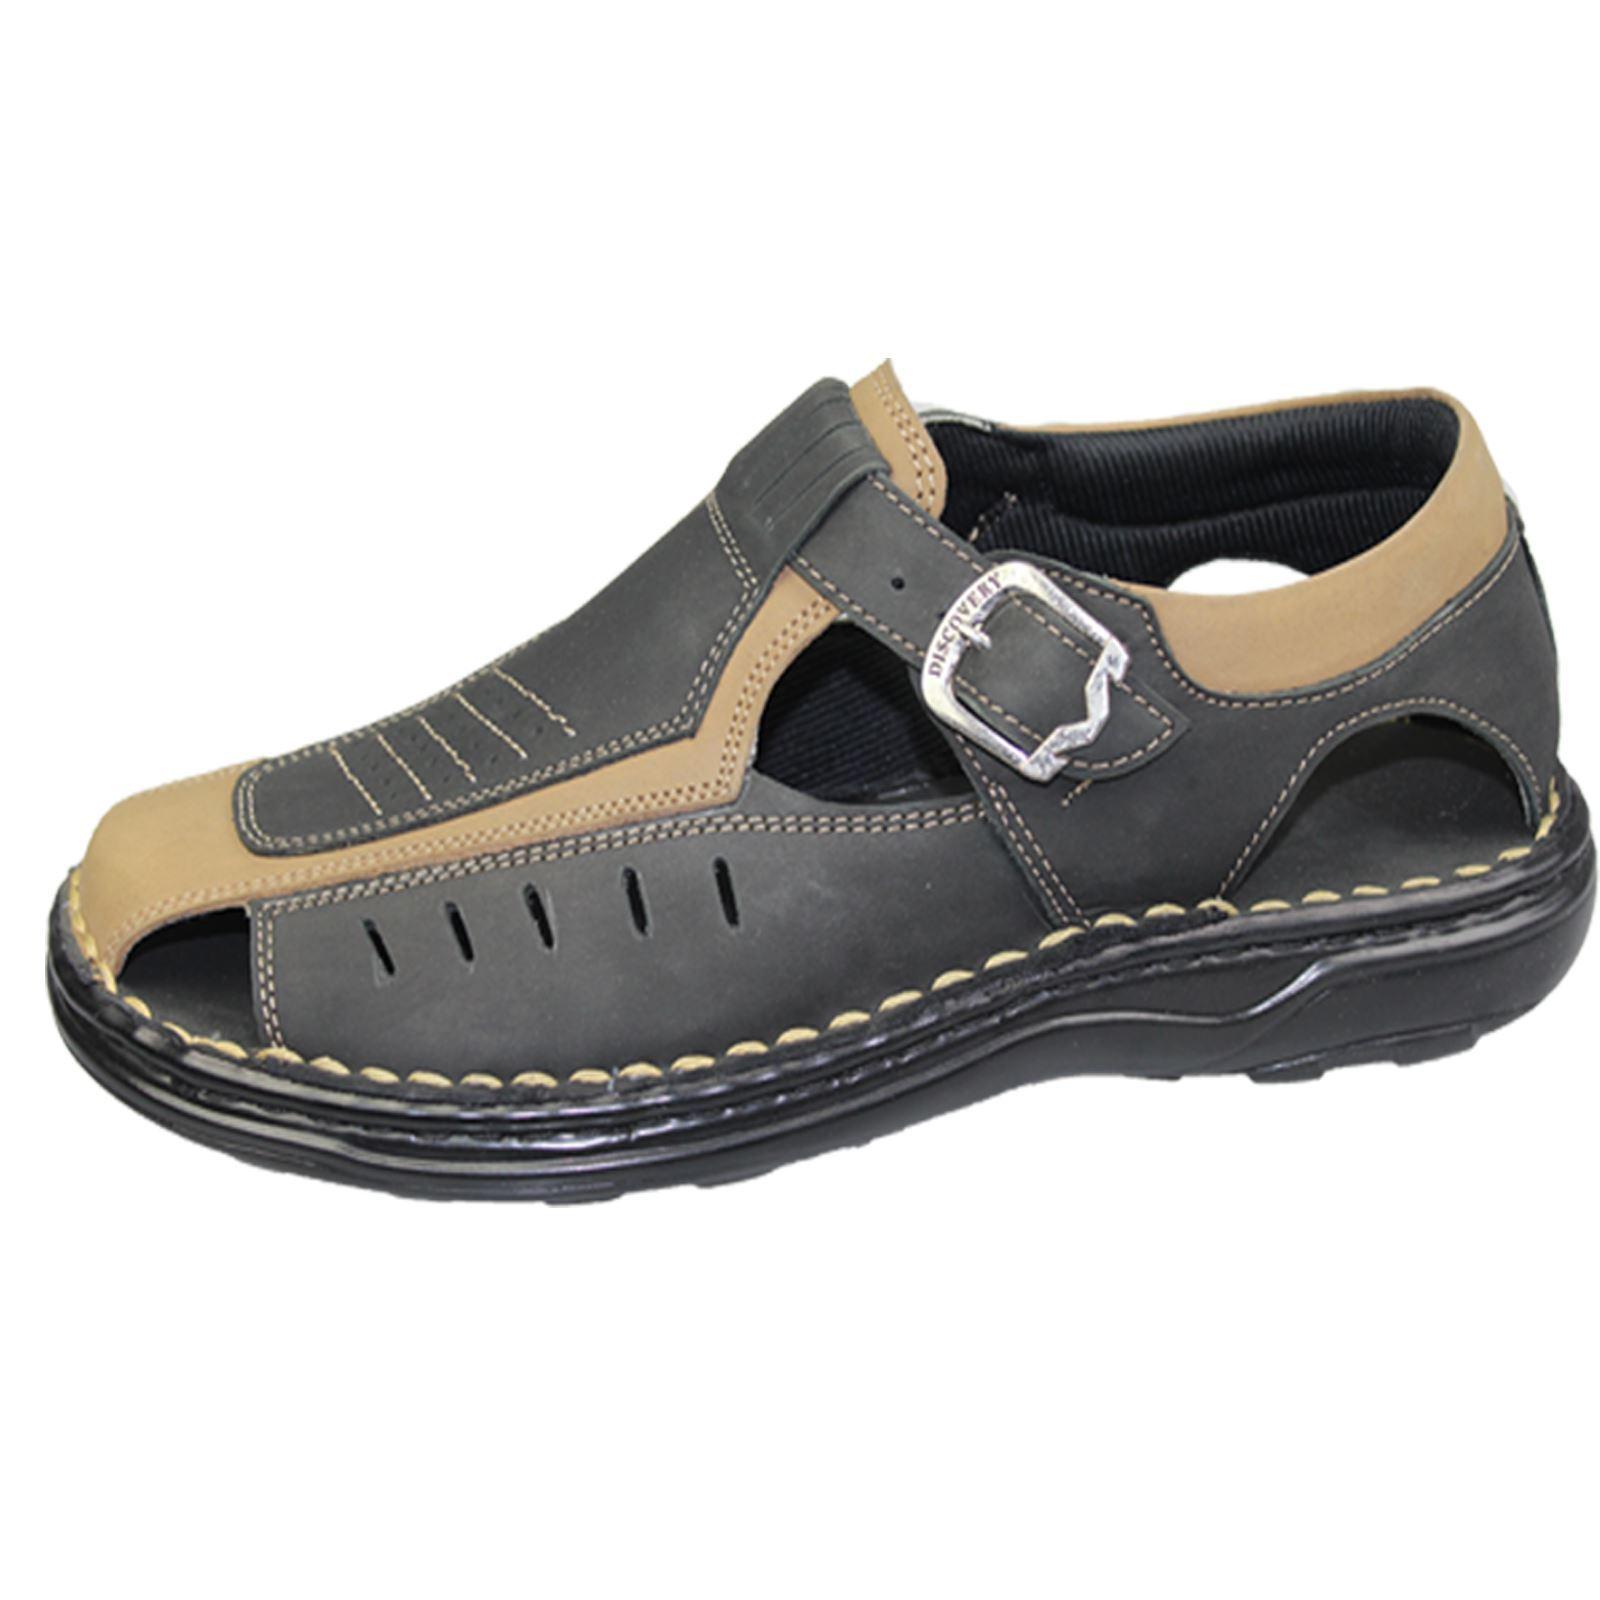 Mens-Buckle-Fastening-Sandals-Flat-Beach-Walking-Fashion-Casual-Summer-Slipper miniatura 6